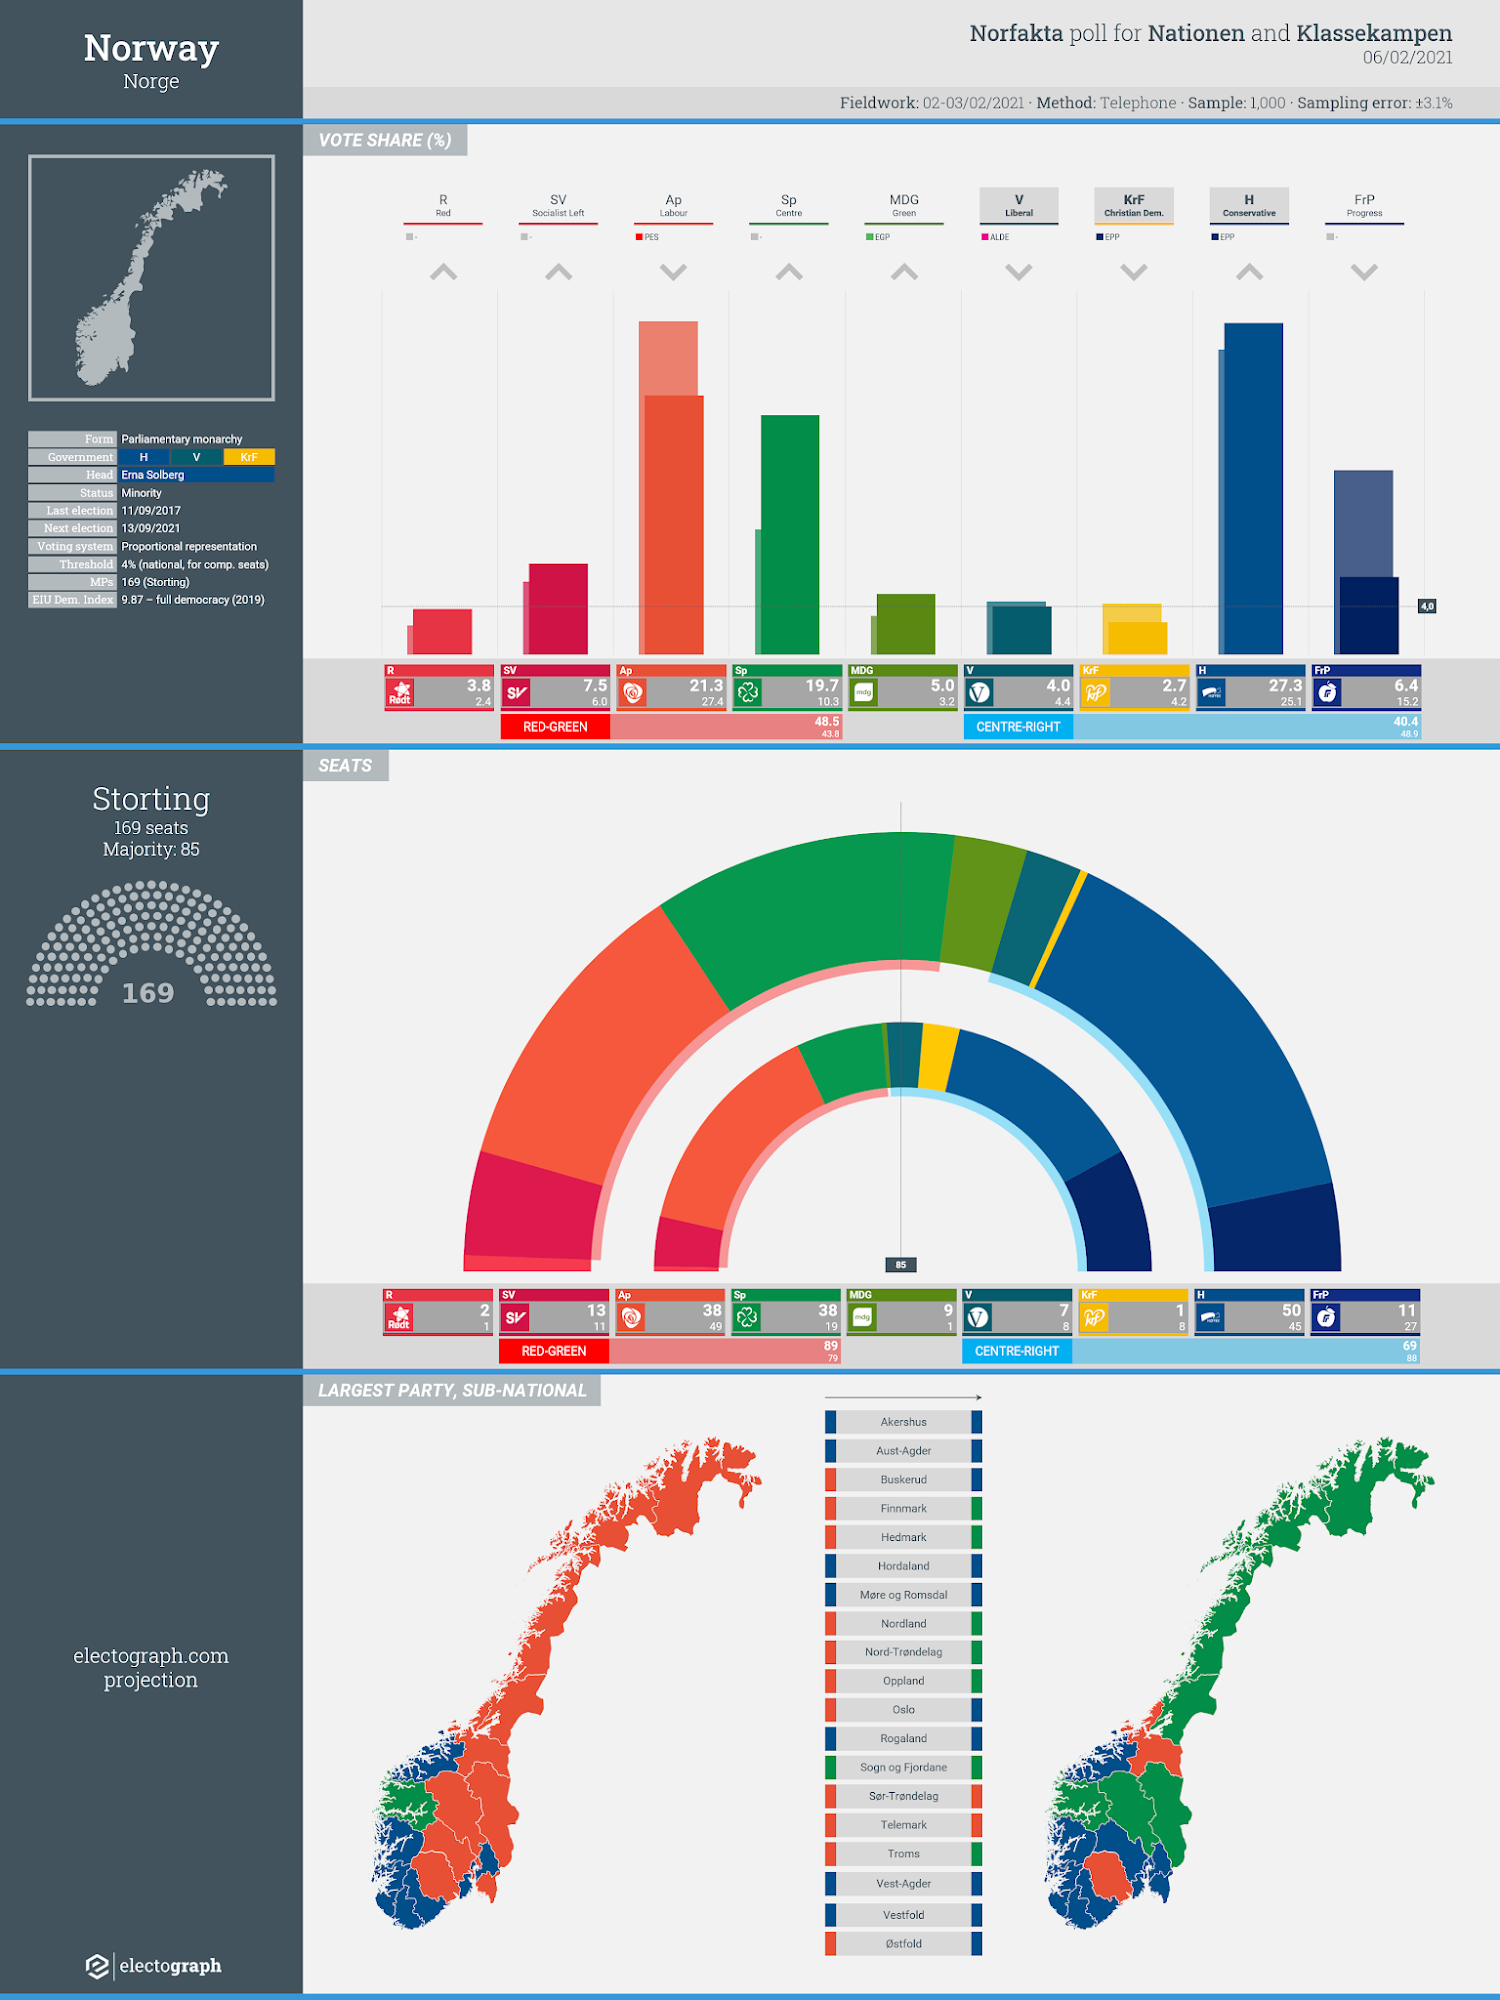 NORWAY: Norfakta poll chart for Nationen and Klassekampen, 6 February 2021